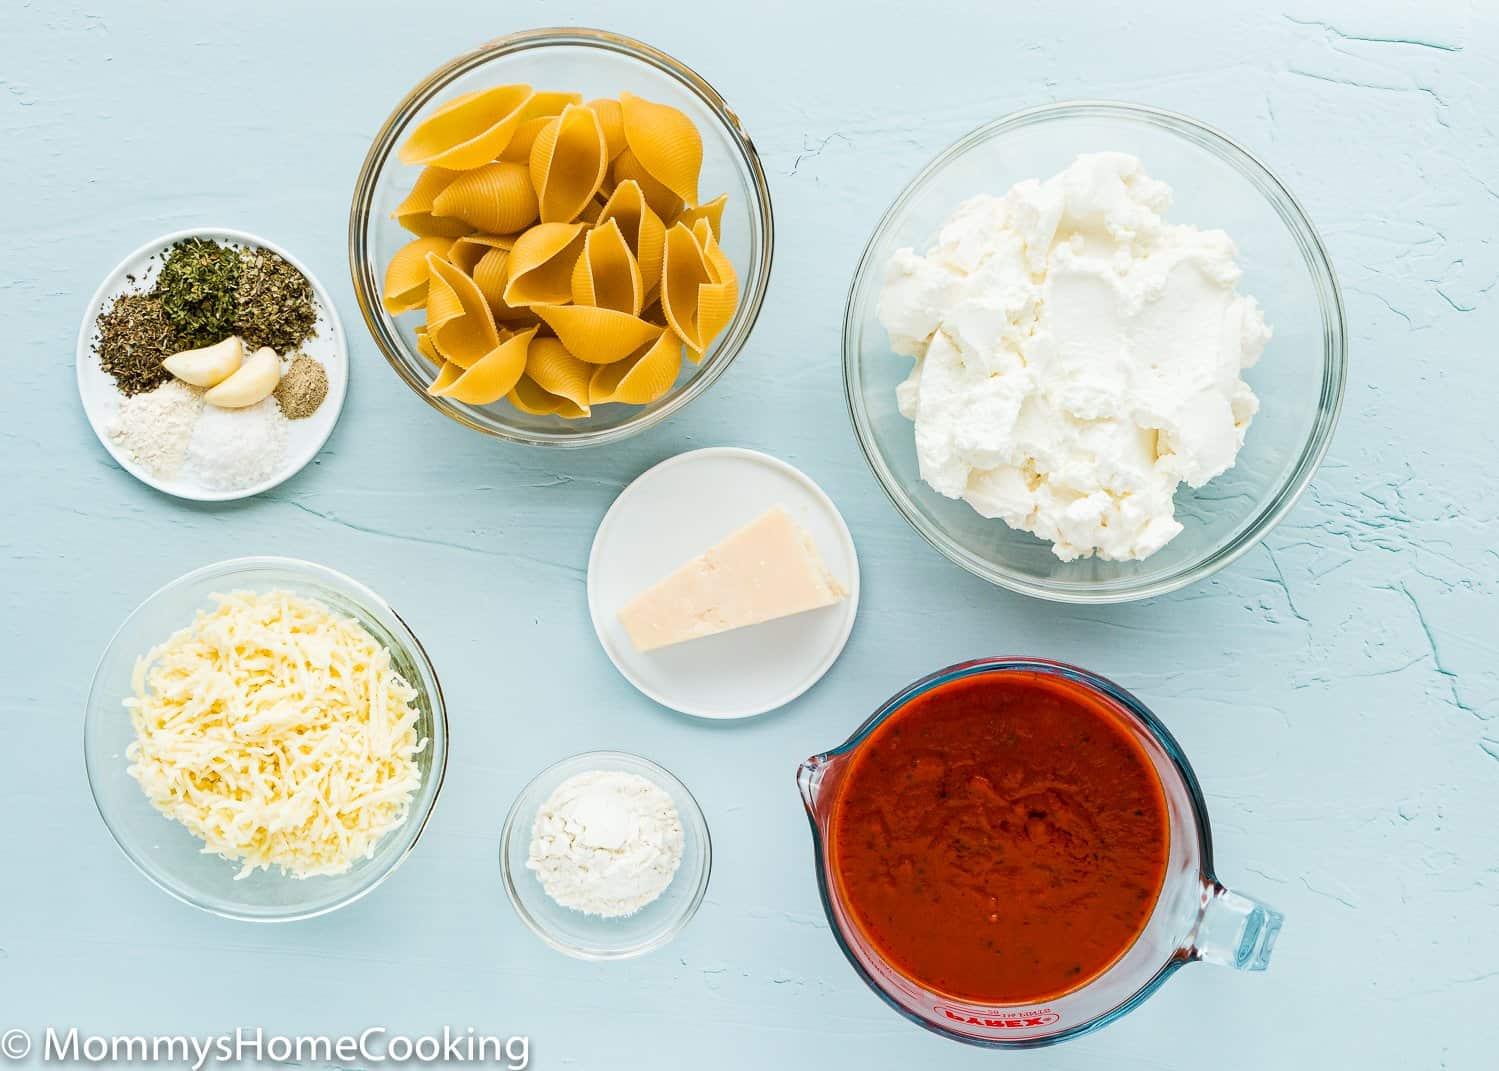 Eggless Ricotta Stuffed Shells ingredients